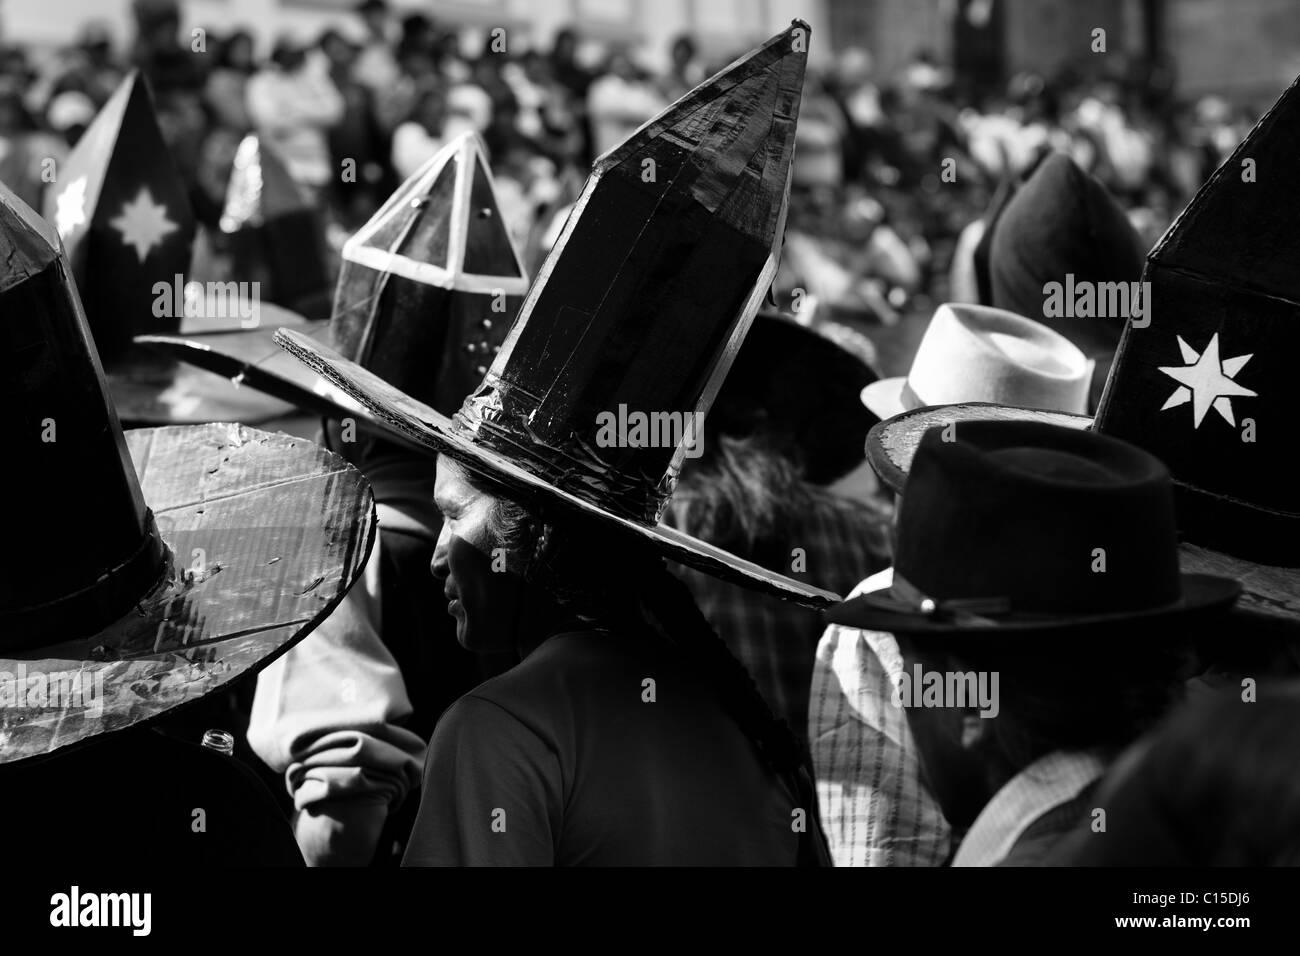 Indians, wearing black cardboard hats, dance during the Inti Raymi (San Juan) festivities in Cotacachi, Ecuador. - Stock Image